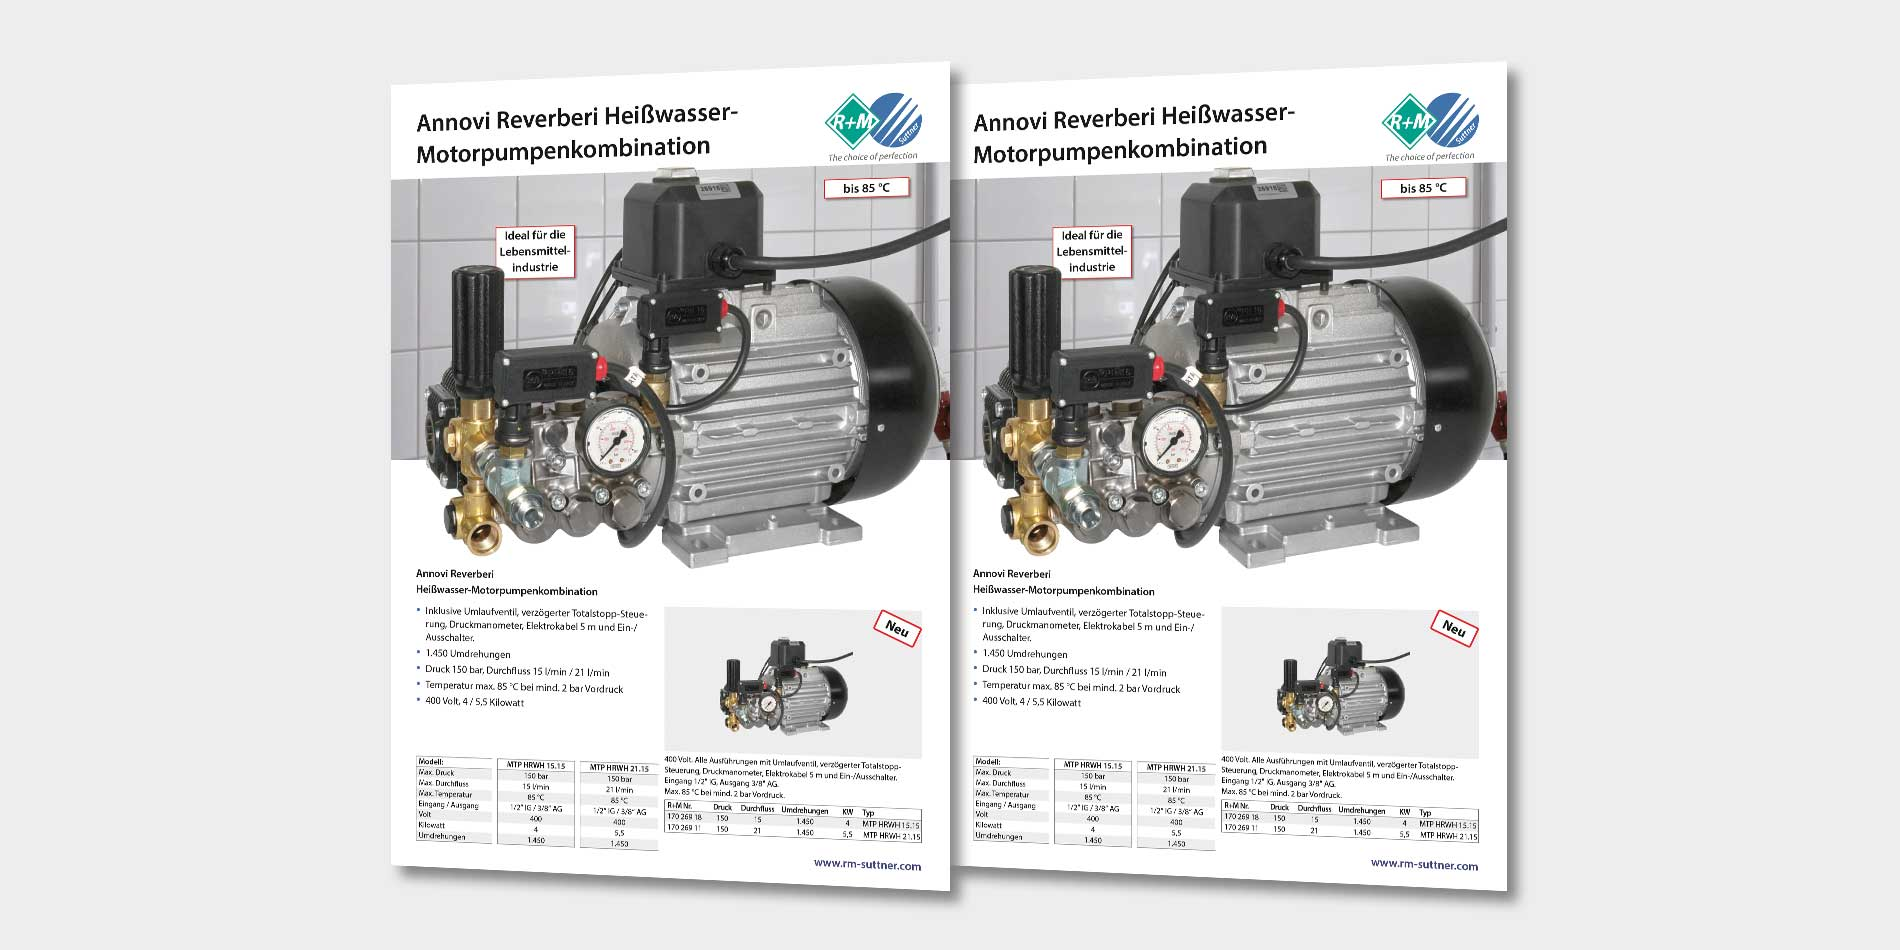 Annovi Reverberi Heißwasser- Motorpumpenkombination